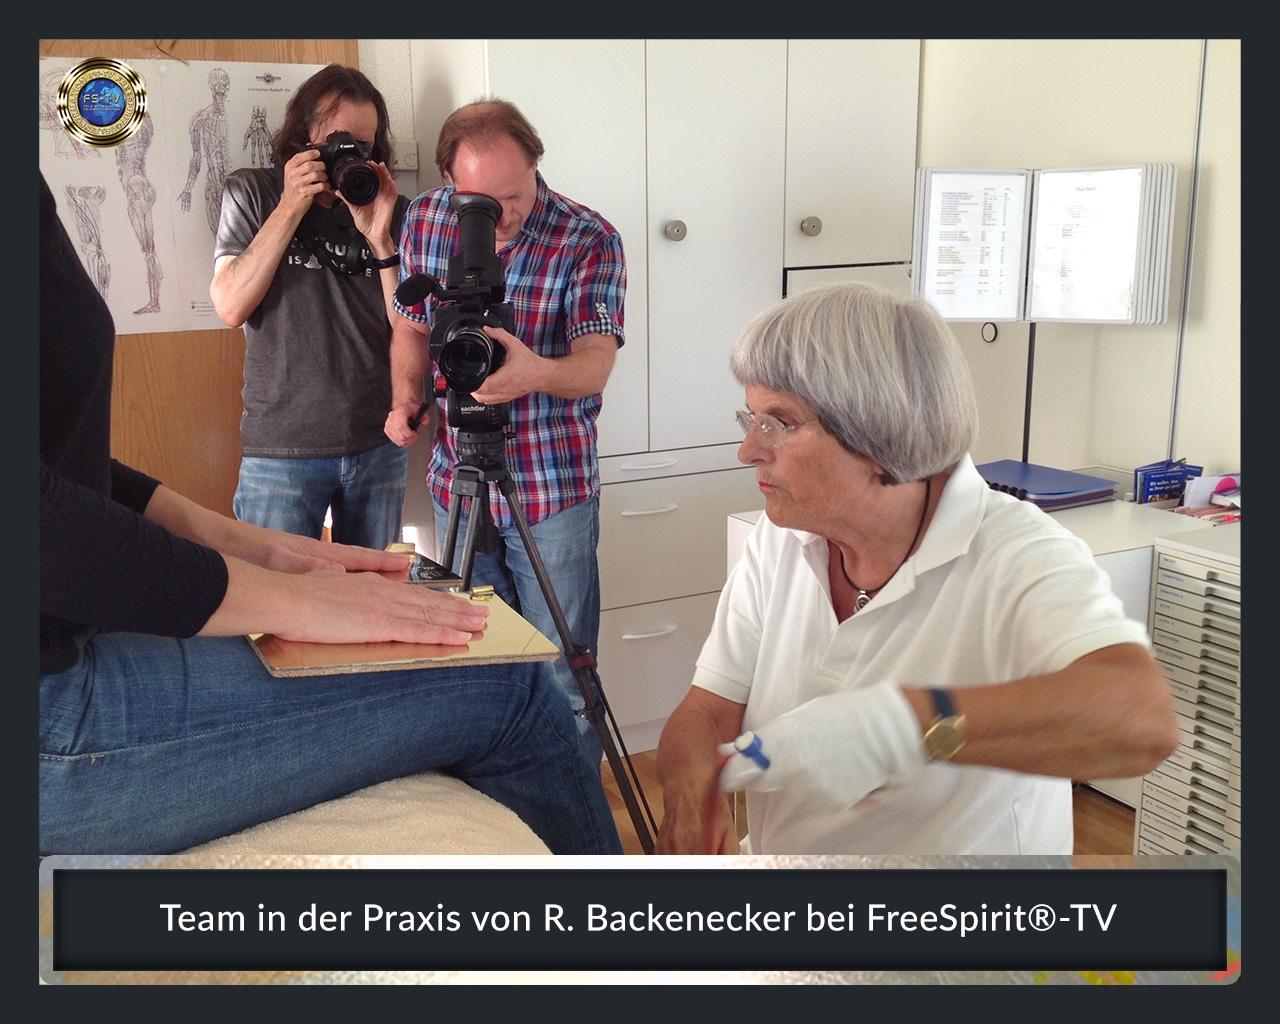 FS-TV-Bildergallerie-Team-in-Praxis